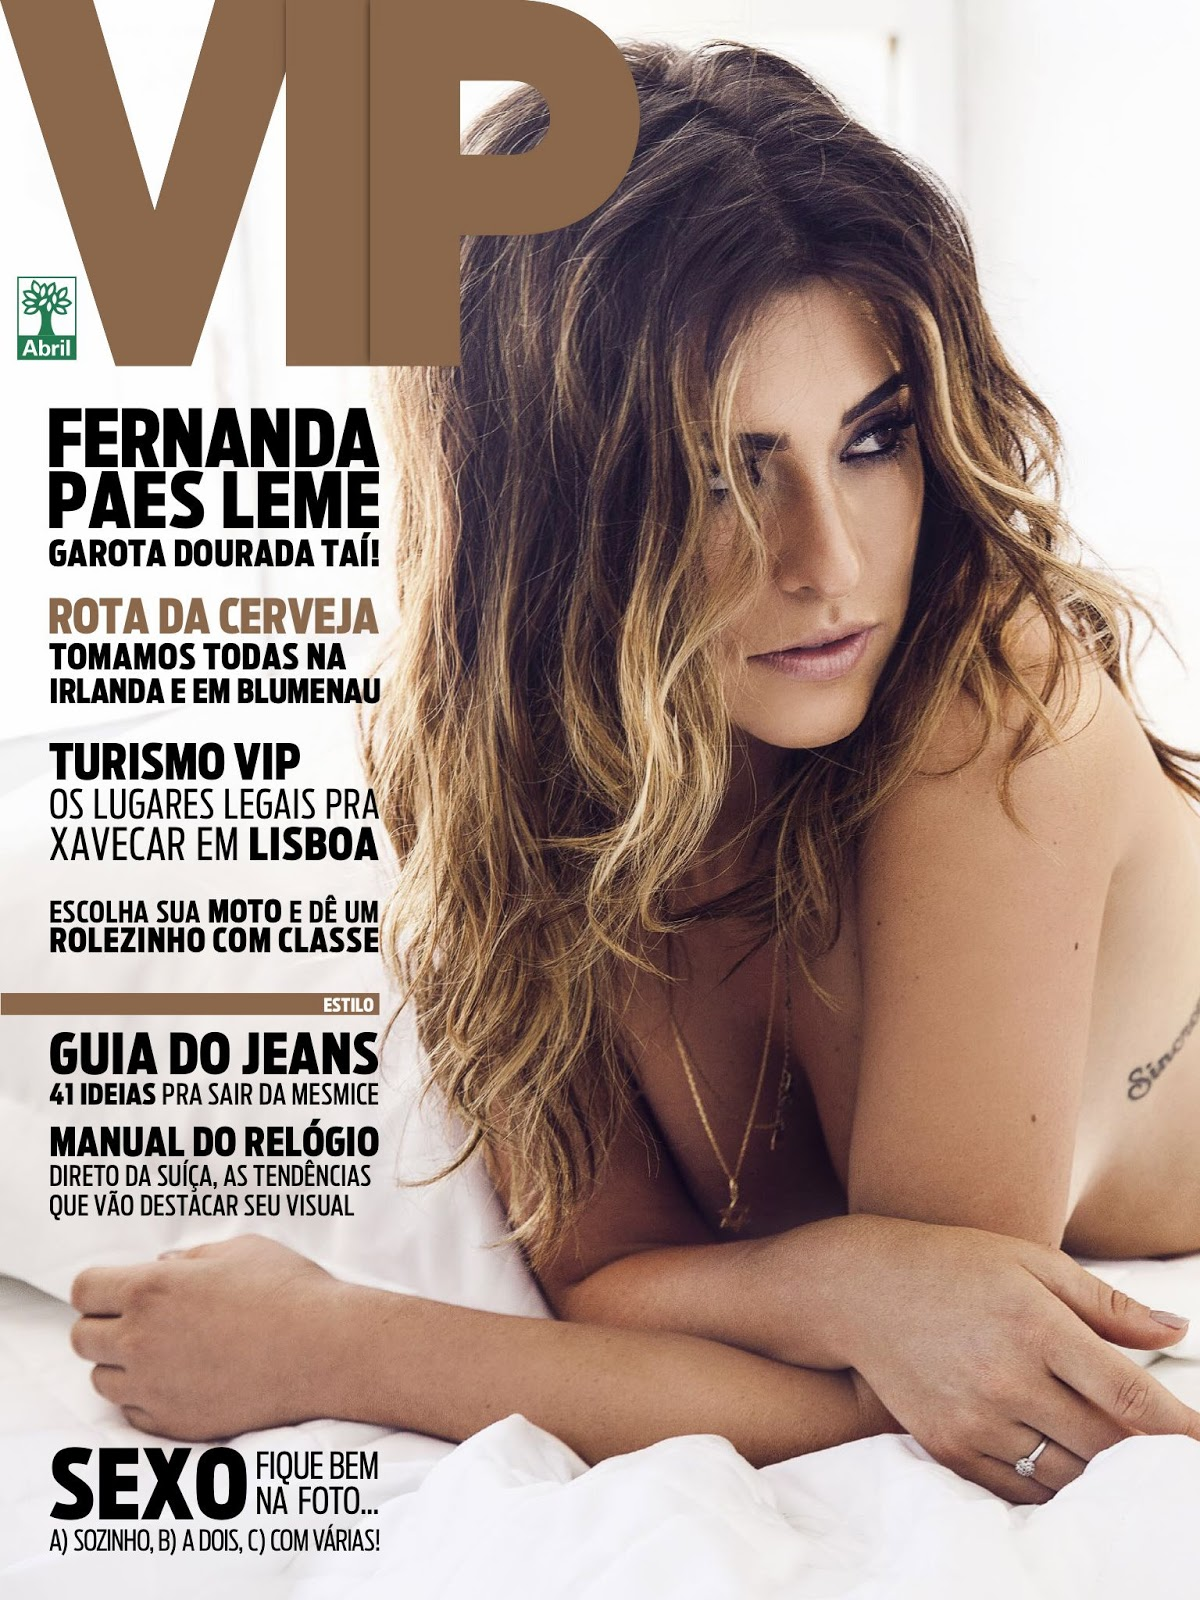 baixar Revista Vip   Fernanda Paes Leme   Maio 2014 download